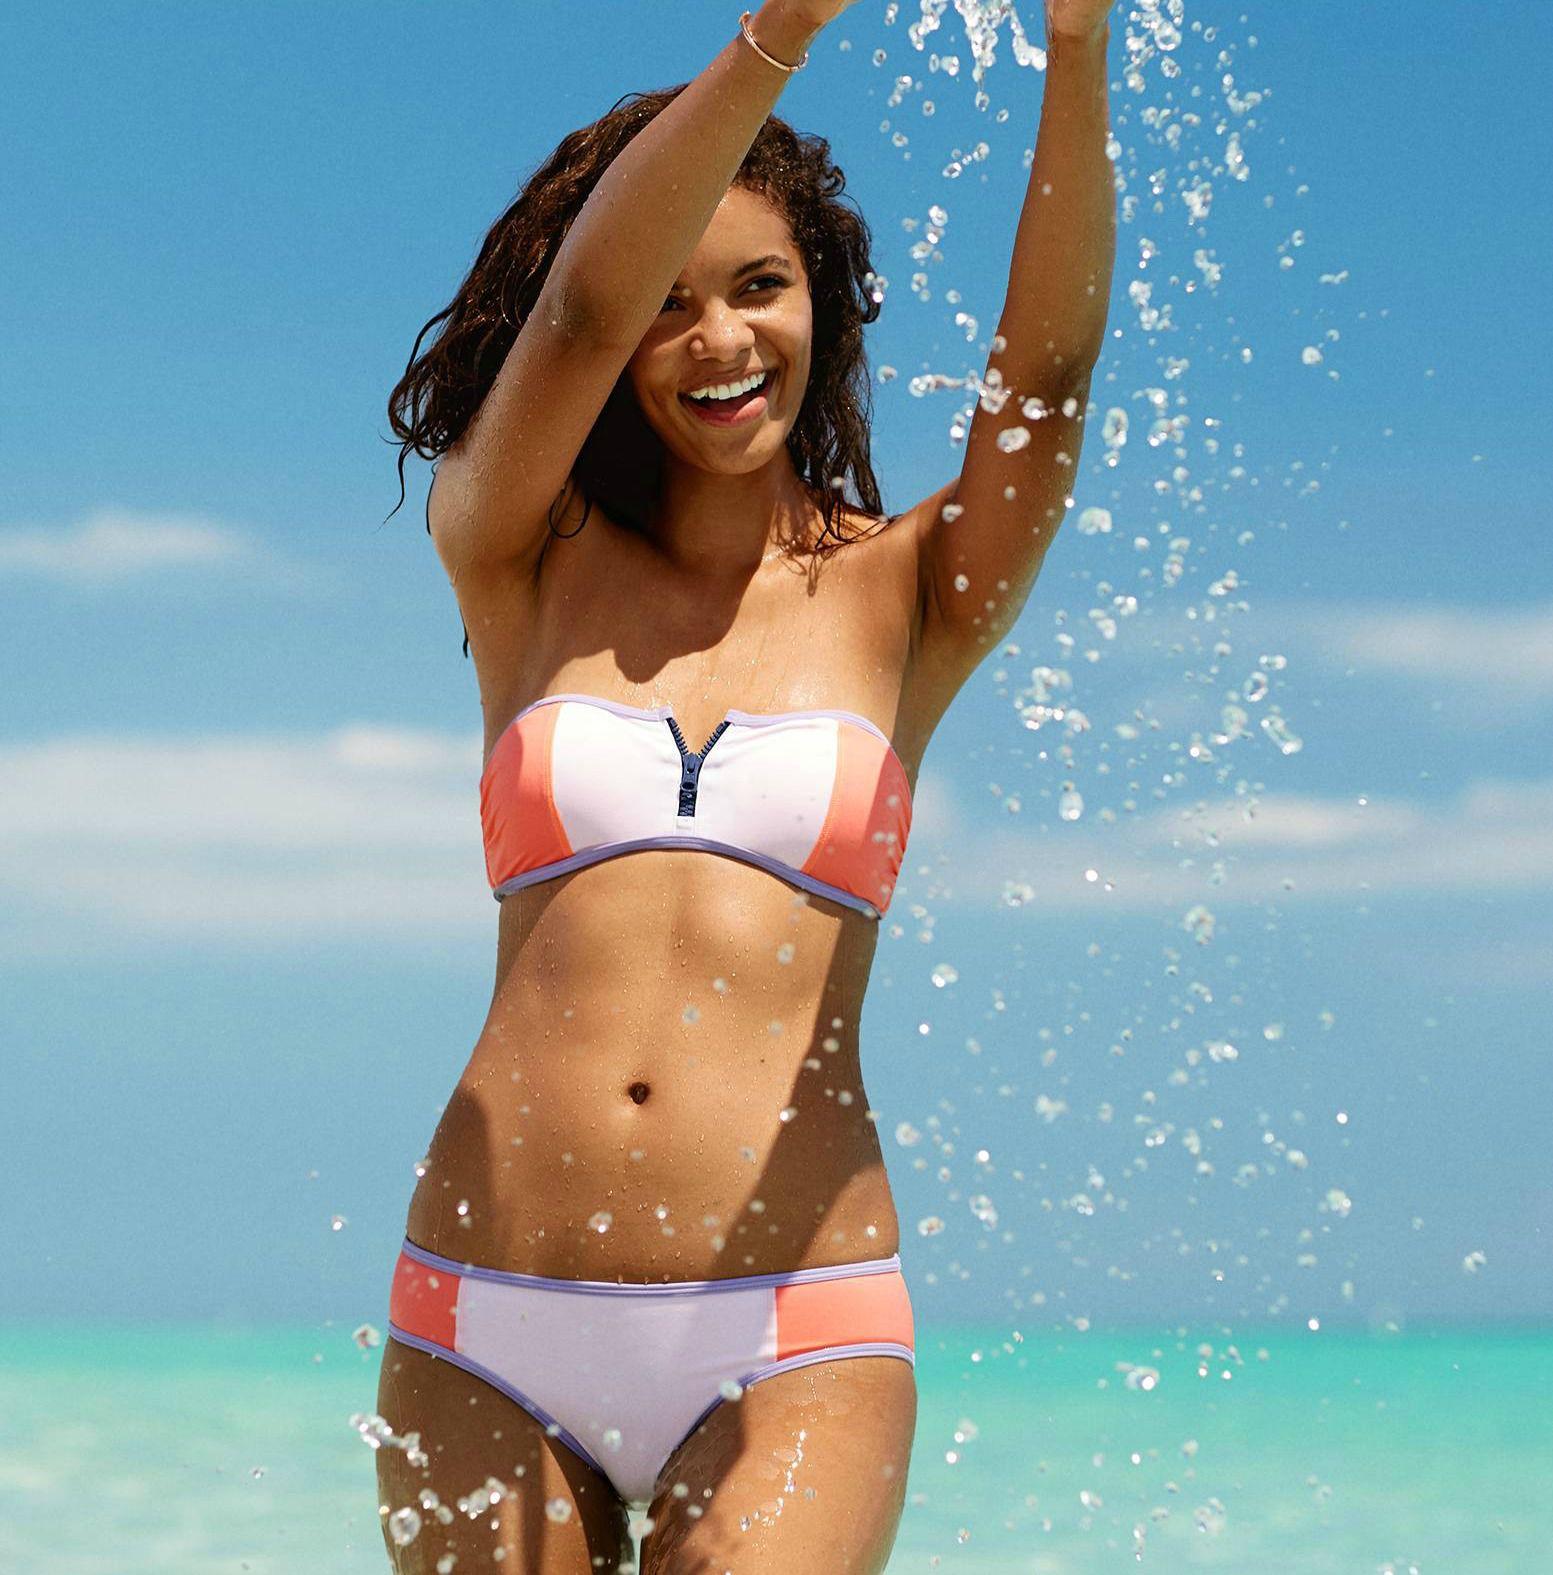 Aerie Zipper Bandeau Bikini - 12 Cute Swimsuits For Teens-7296